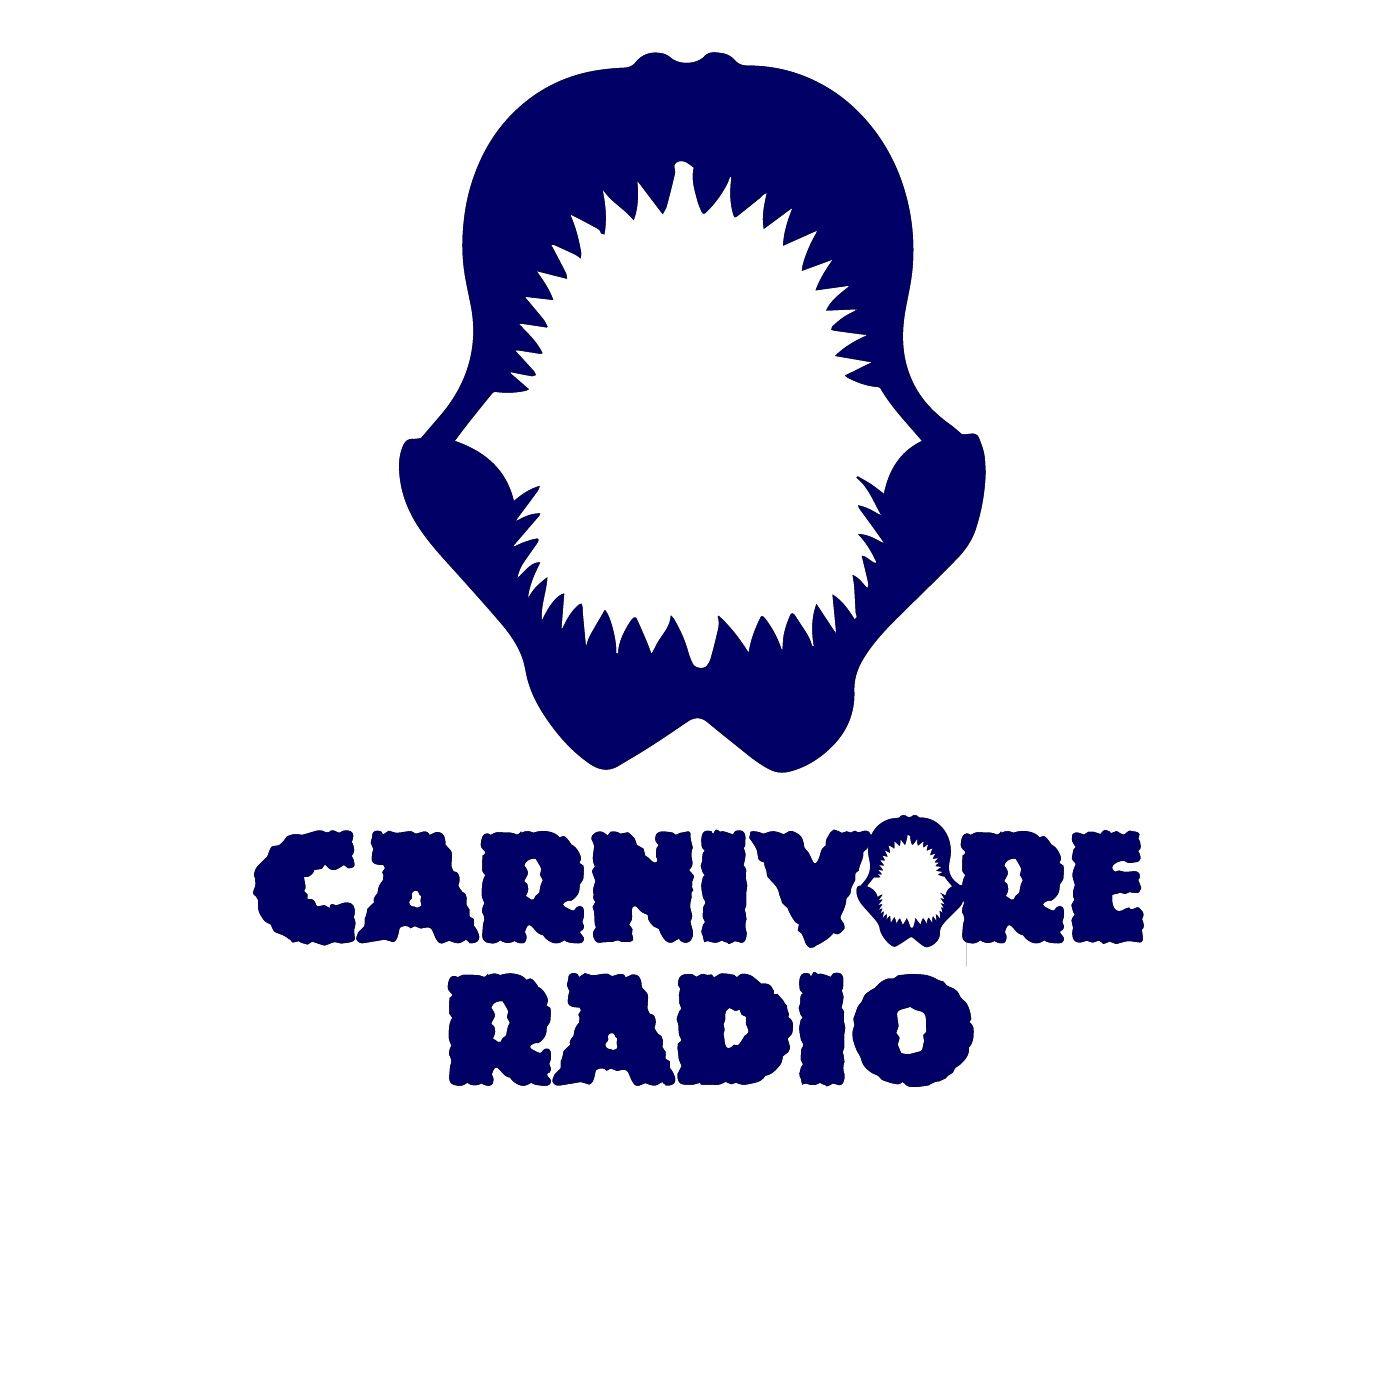 Carnivore Bites - 7-8-21- Episode 154 Biden and the Democratic Shifts